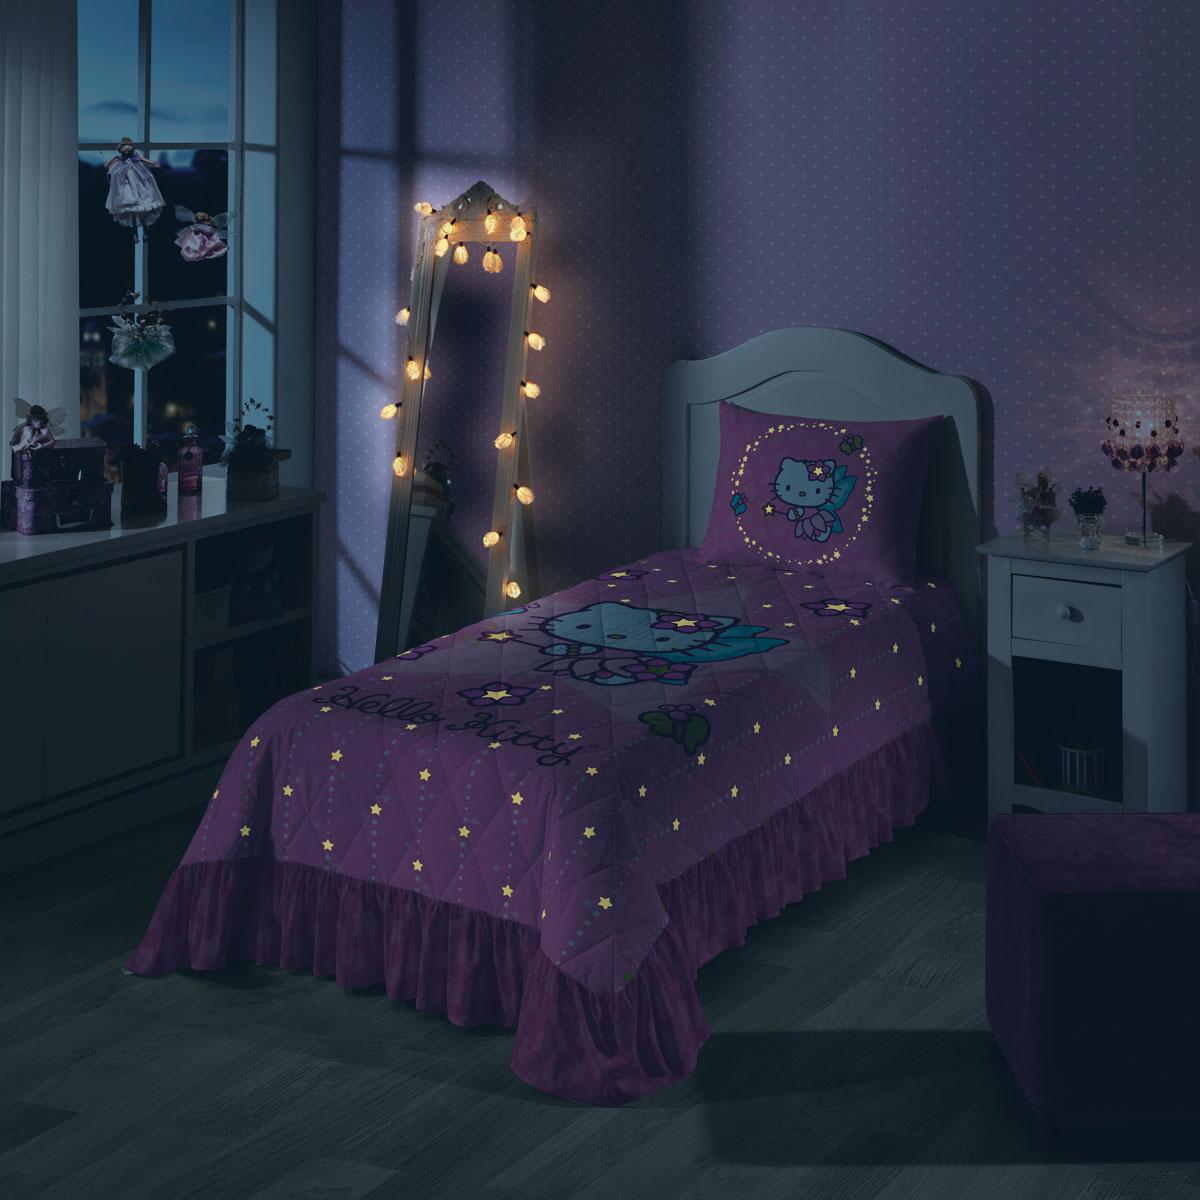 Colcha que Brilha no Escuro Hello Kitty Fada